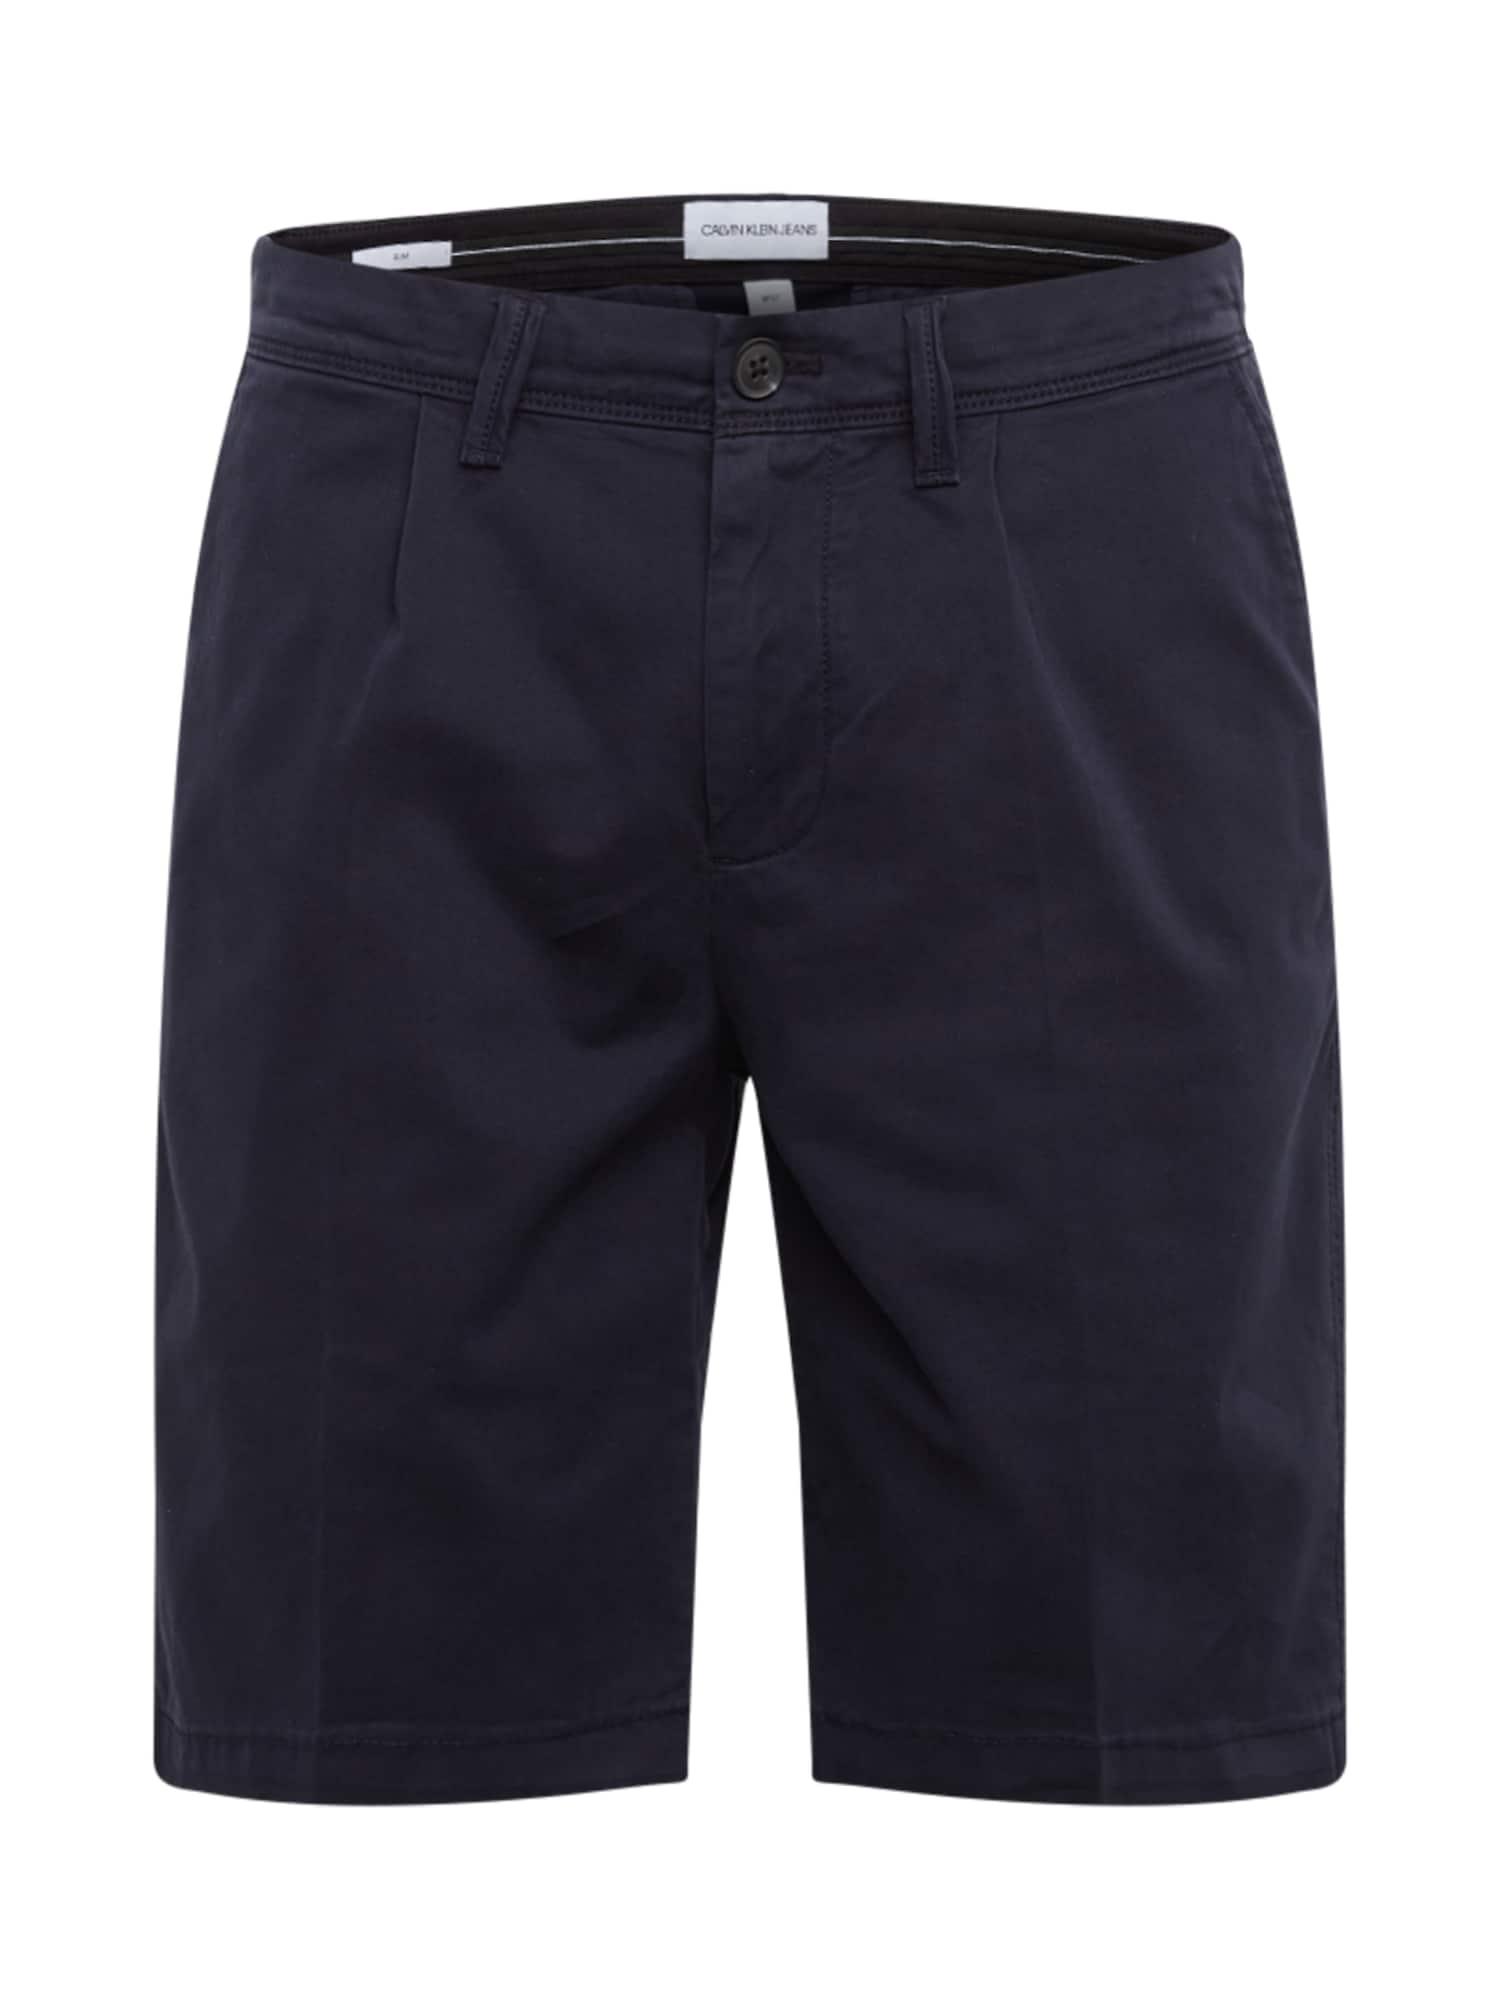 Calvin Klein Jeans Kelnės '026 PLEATED SHORT' nakties mėlyna